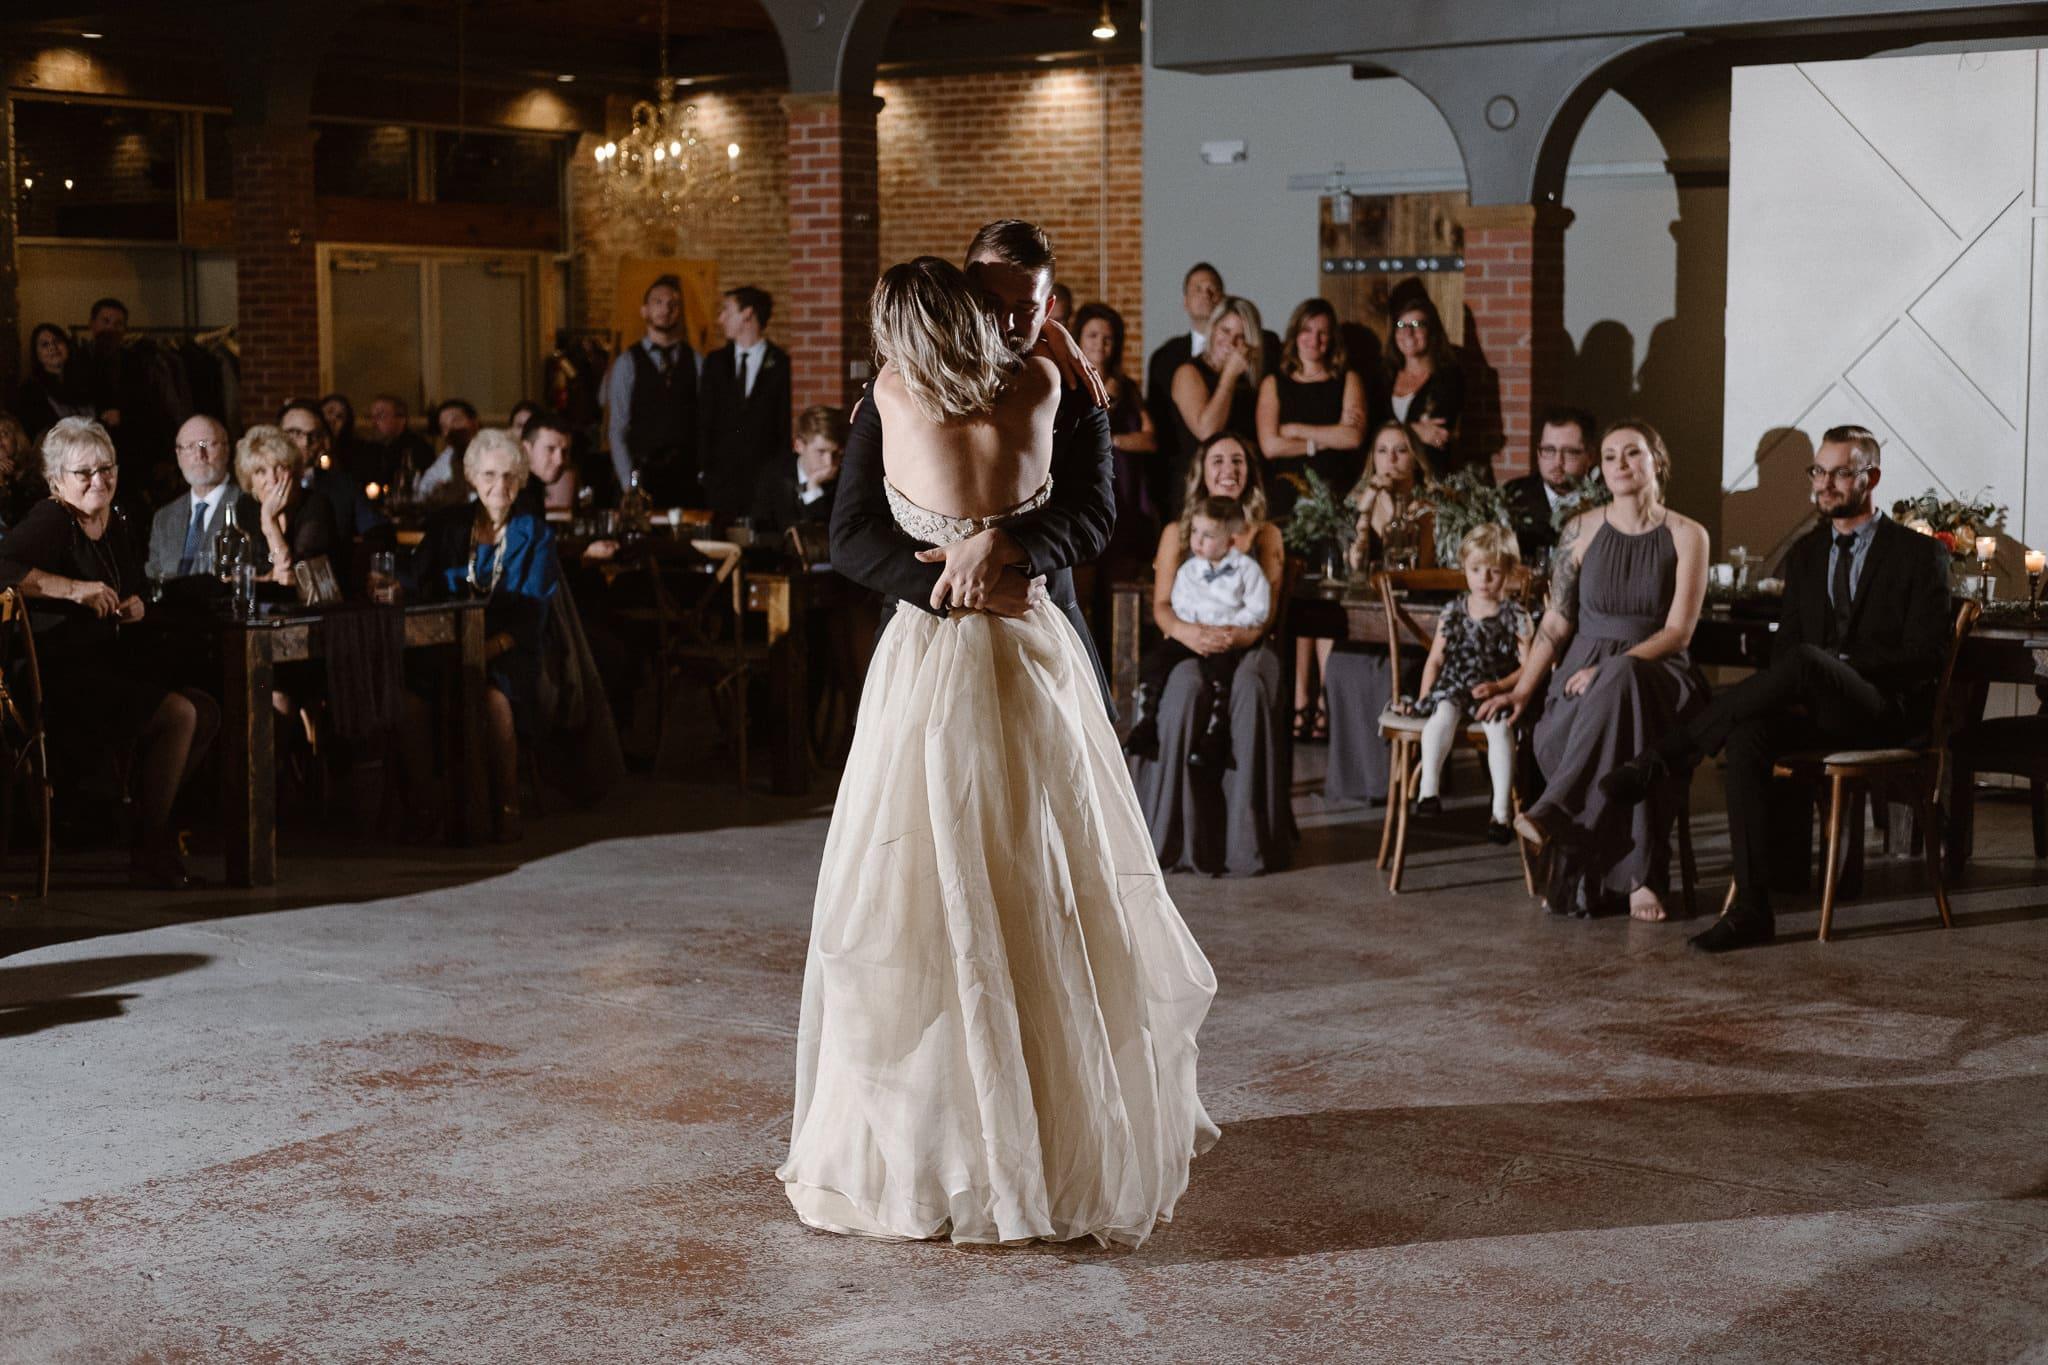 St Vrain Wedding Photographer   Longmont Wedding Photographer   Colorado Winter Wedding Photographer, Colorado industrial chic wedding ceremony, bride and groom first dance, off camera flash photography reception lighting